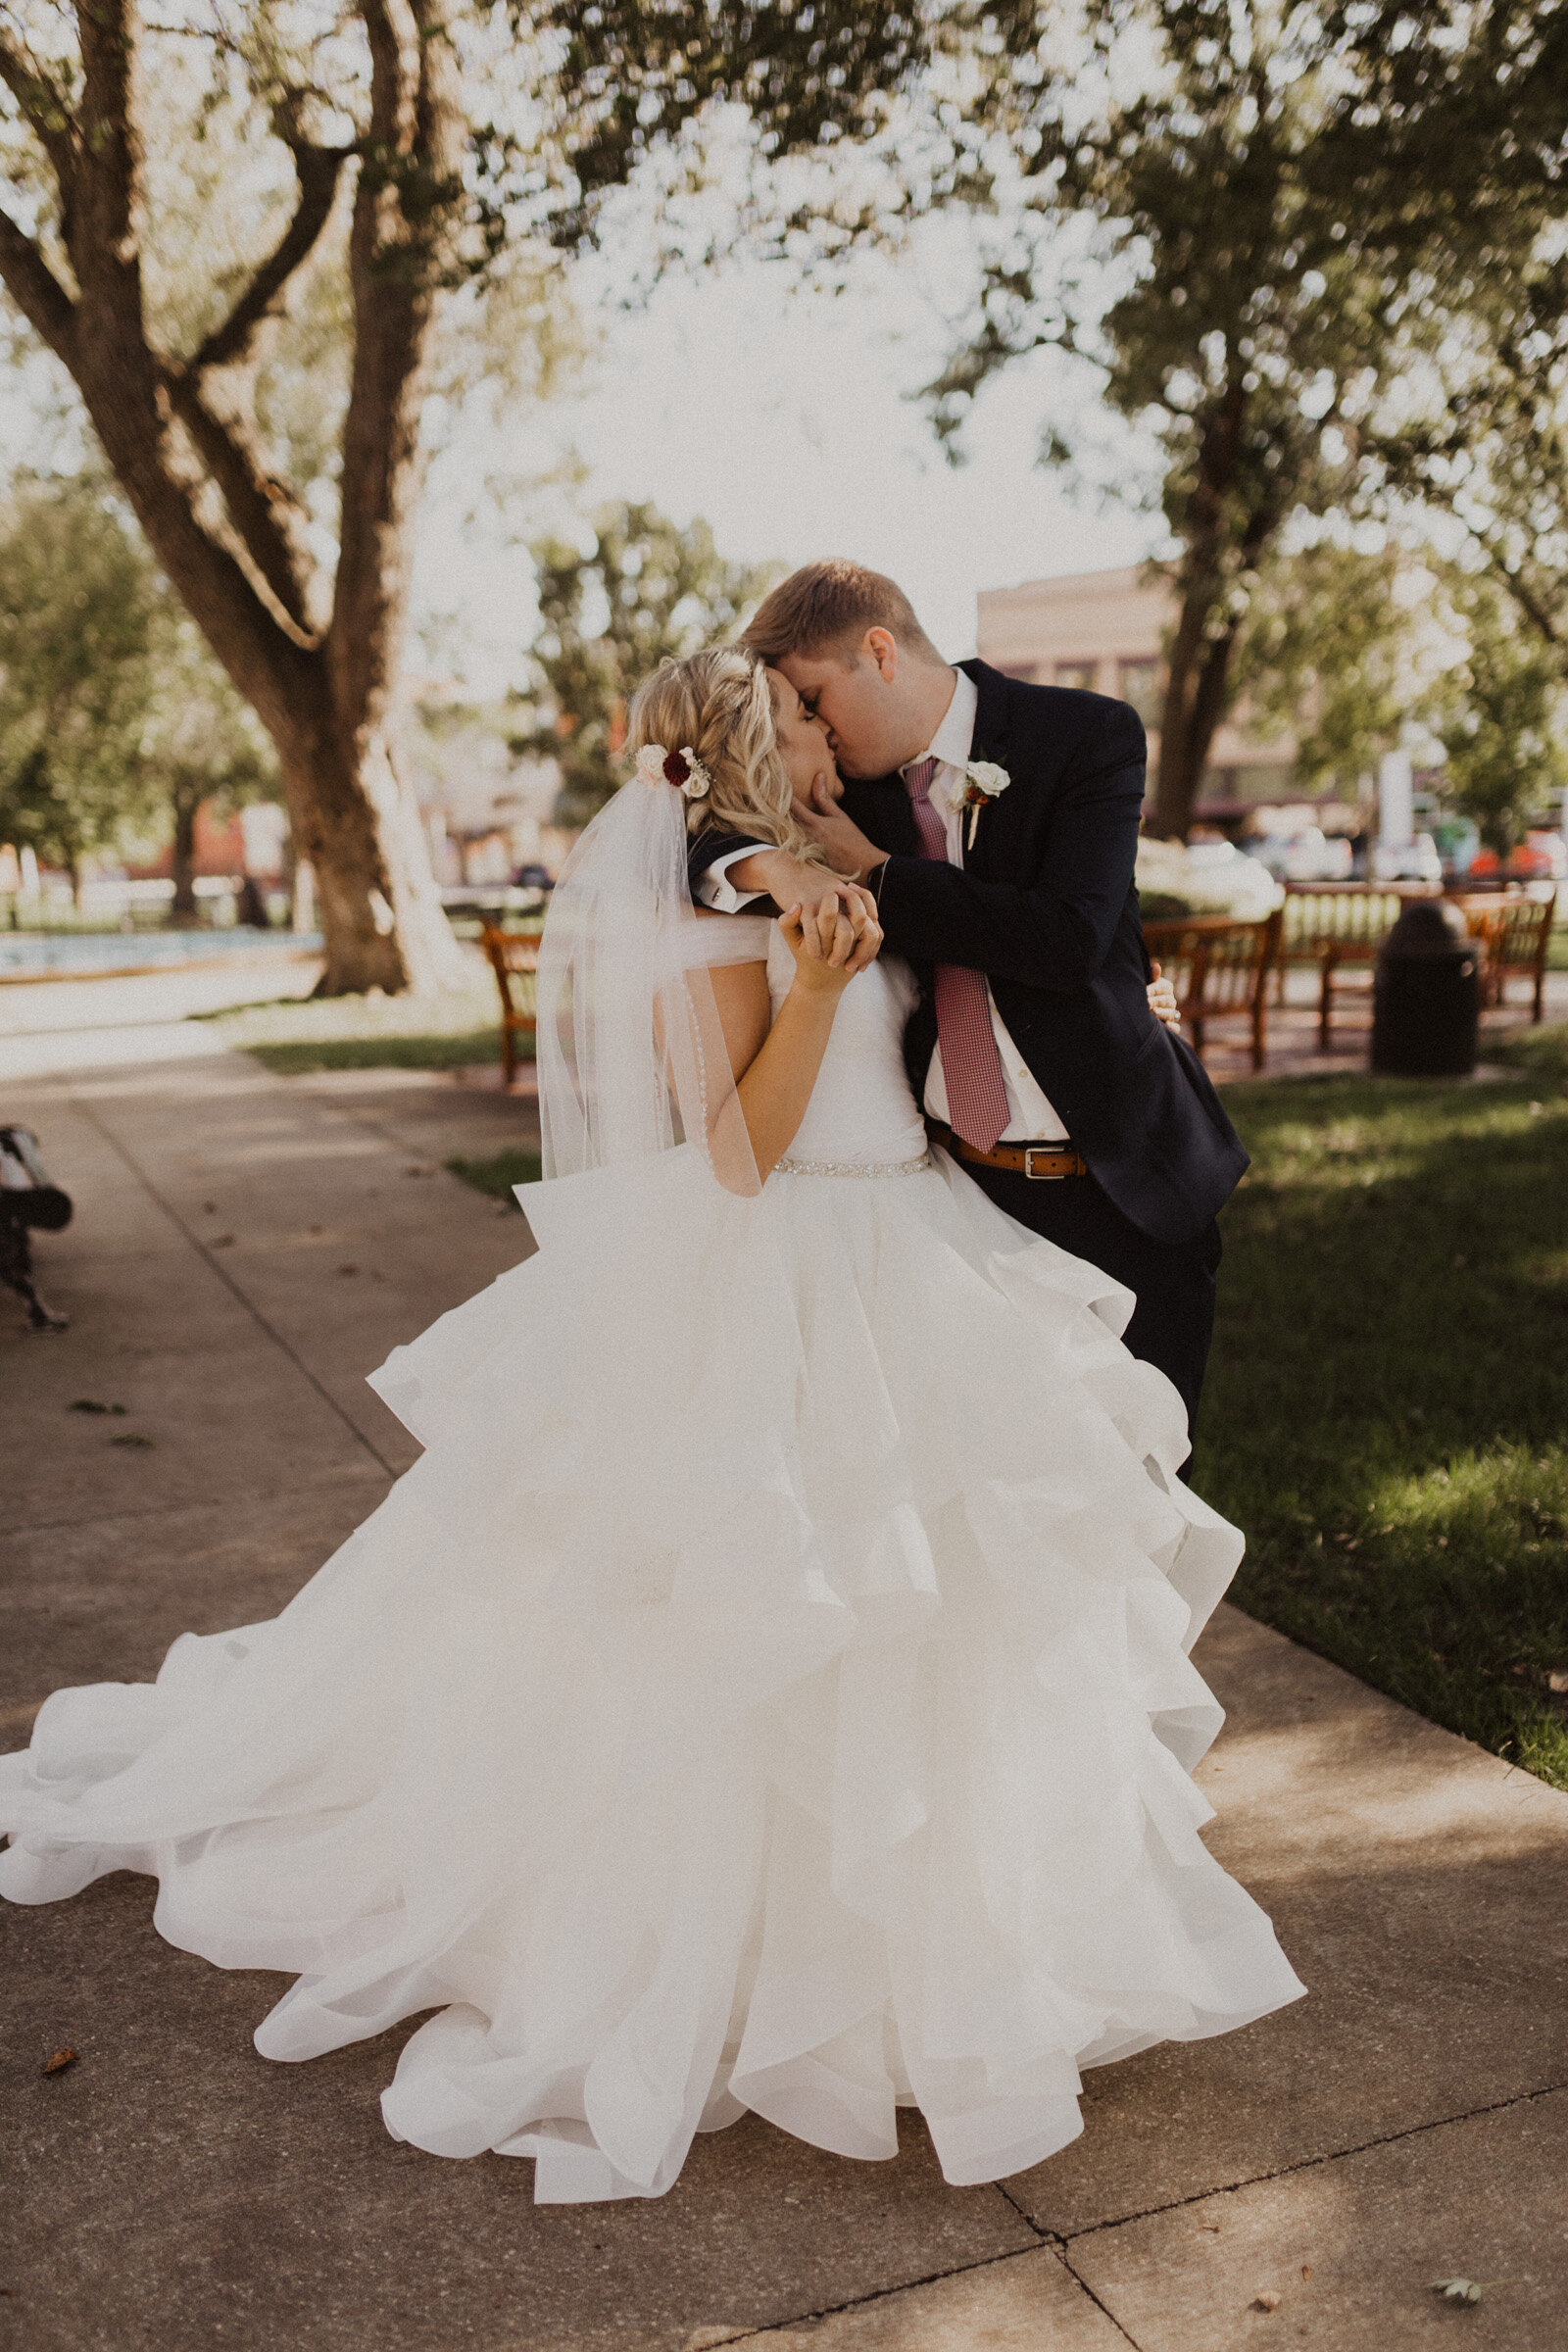 alyssa barletter photography town square paola wedding-22.jpg